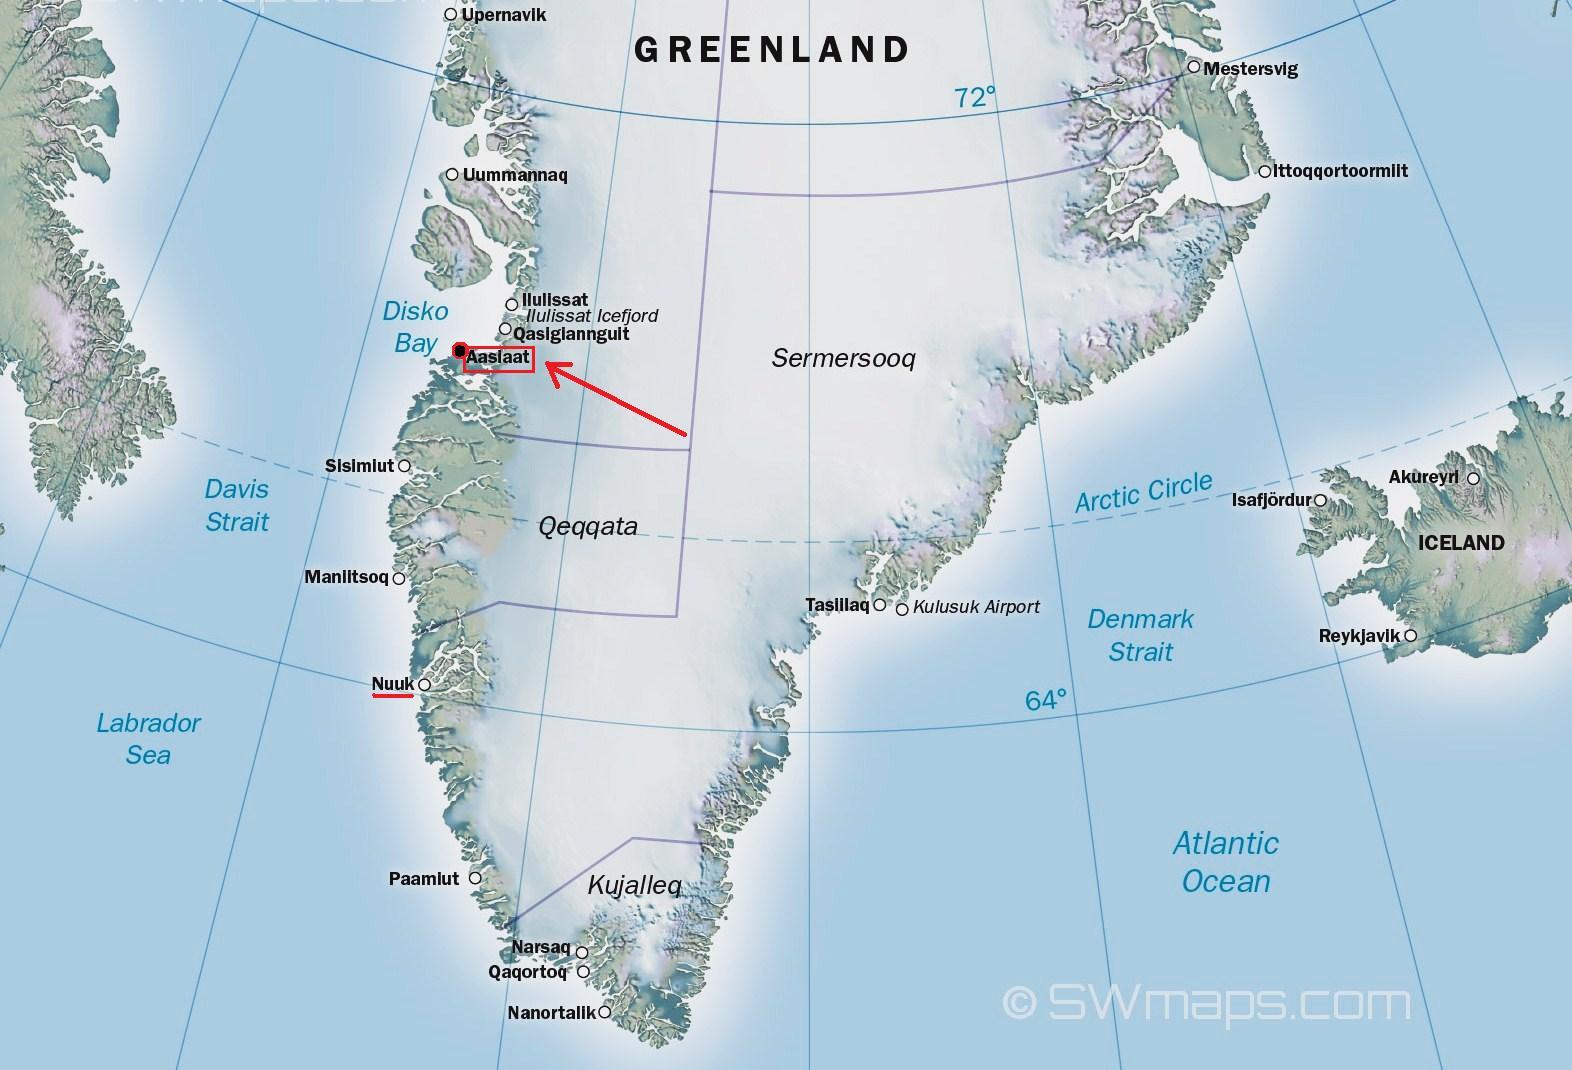 Ultima Thule Aasiaat Greenland - Greenland latitude